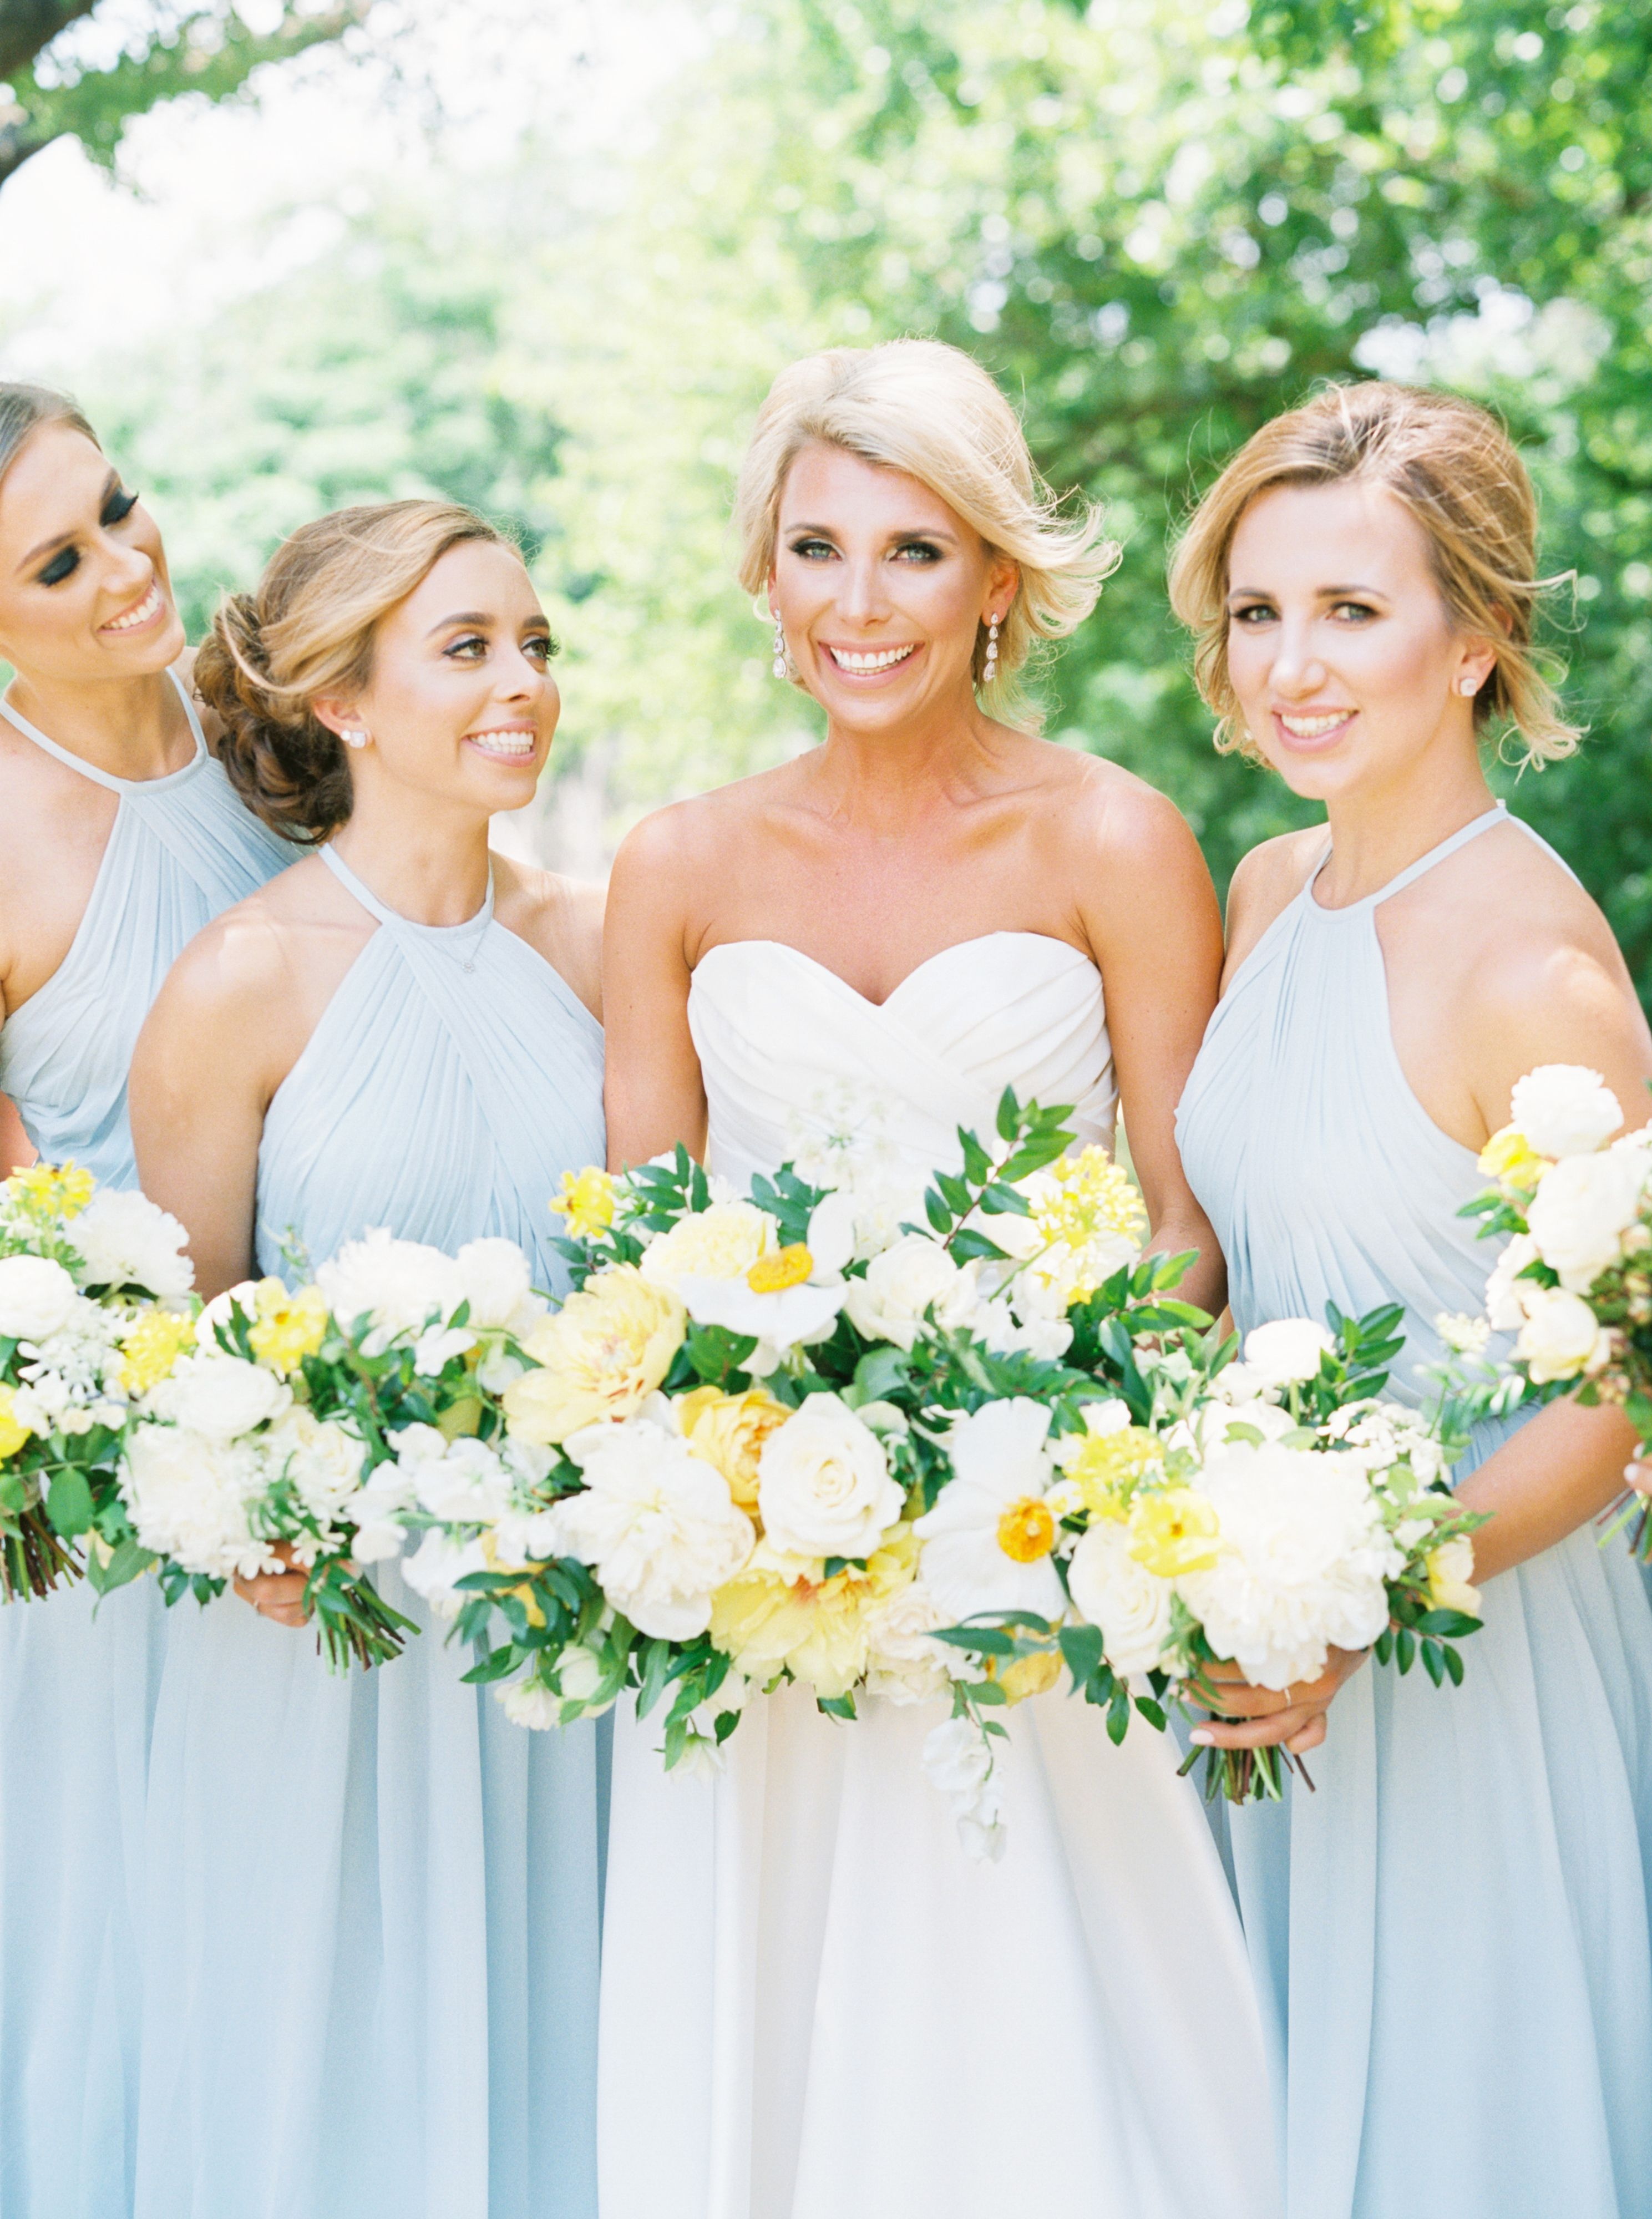 Light Blue Bridesmaid Dress Bridesmaid Dresses Bridesmaids Blue Southern Wedding Dove Ri Light Yellow Weddings Yellow Wedding Theme Yellow Wedding Flowers